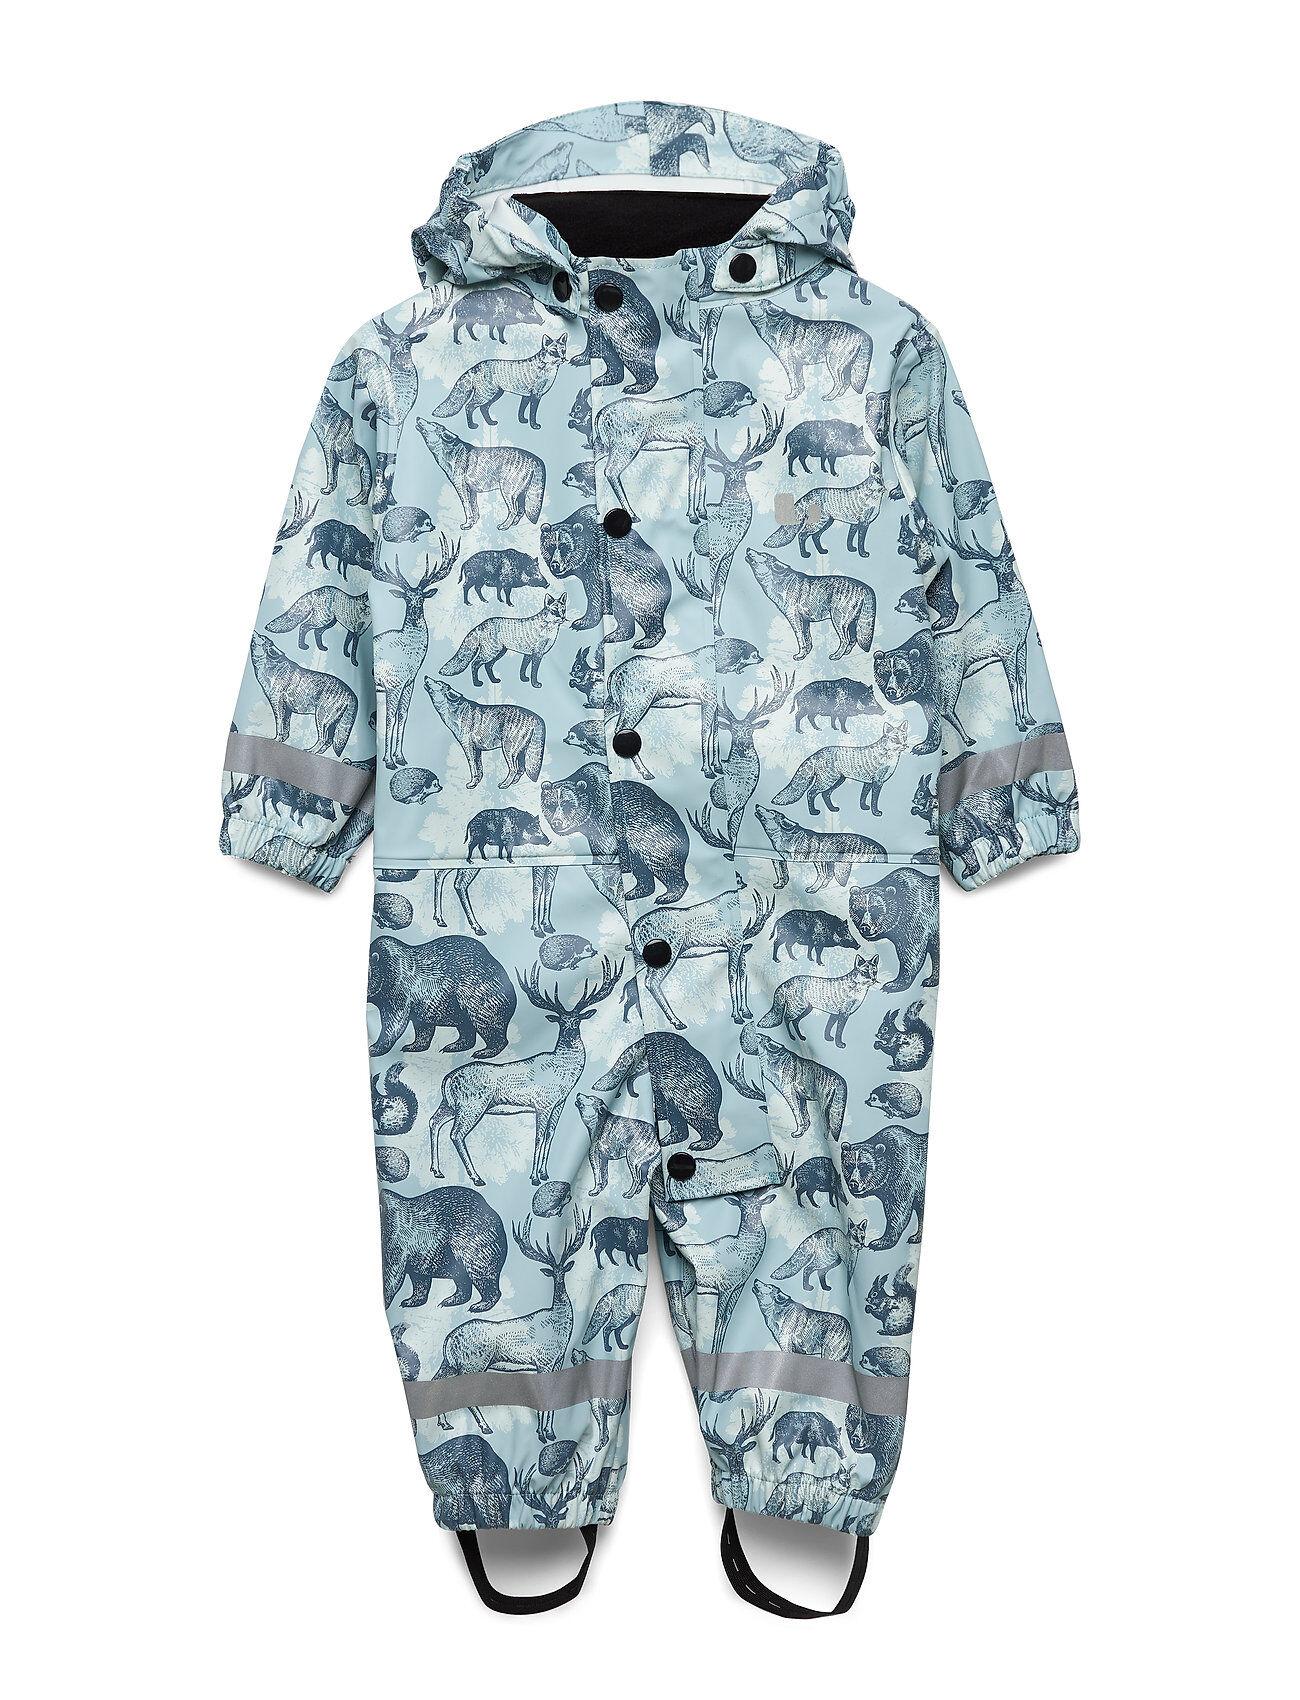 Lindberg Sweden DjurÅS Rain Babyove Outerwear Rainwear Sets & Coveralls Sininen Lindberg Sweden